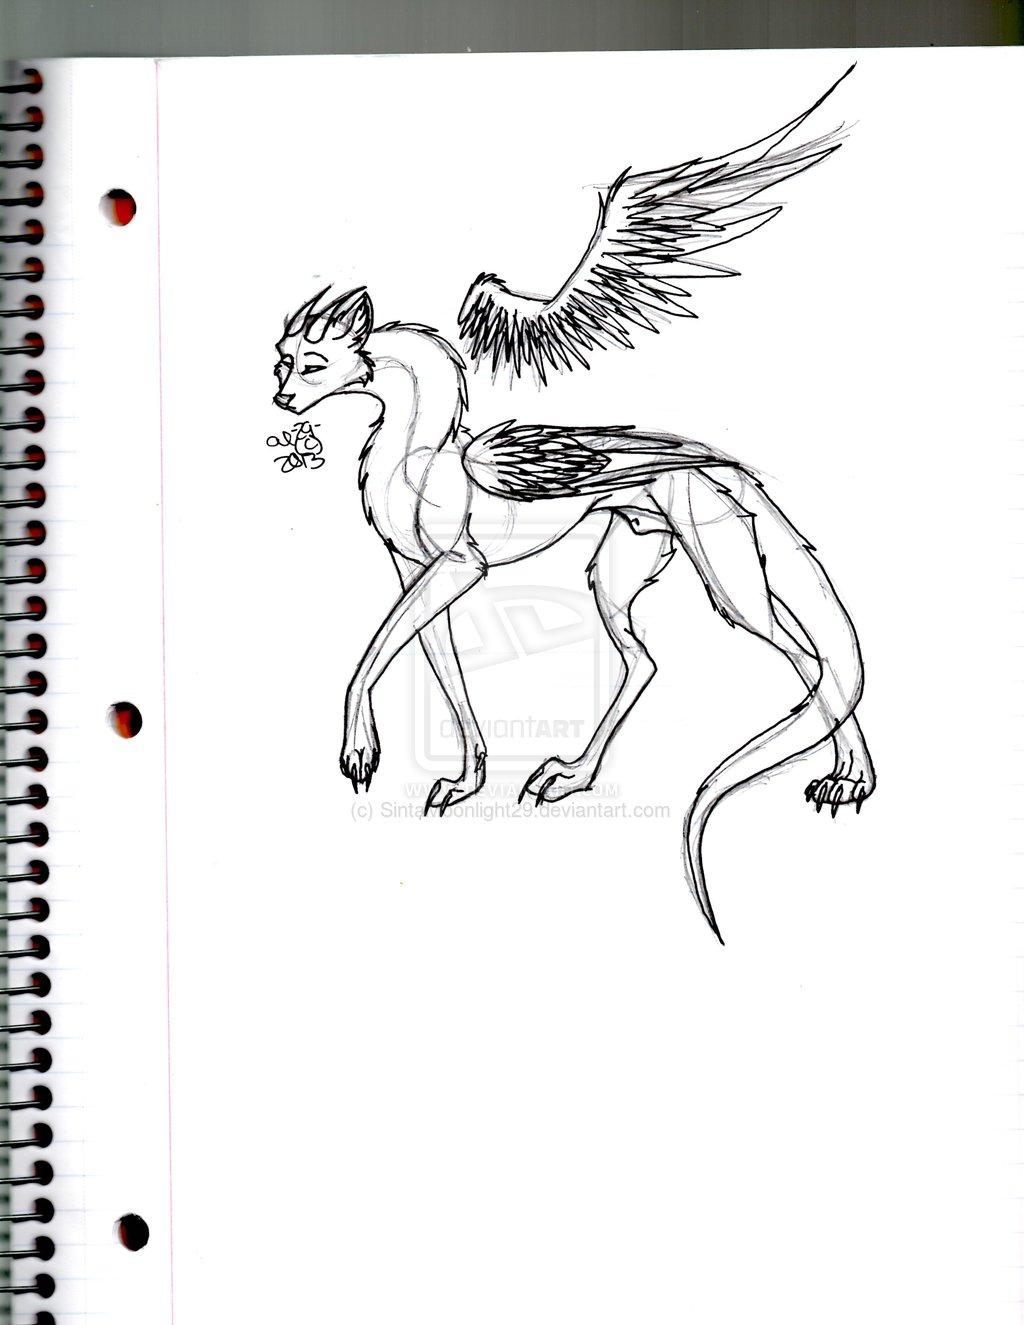 Cal Feral Sketch - Gift Art #2